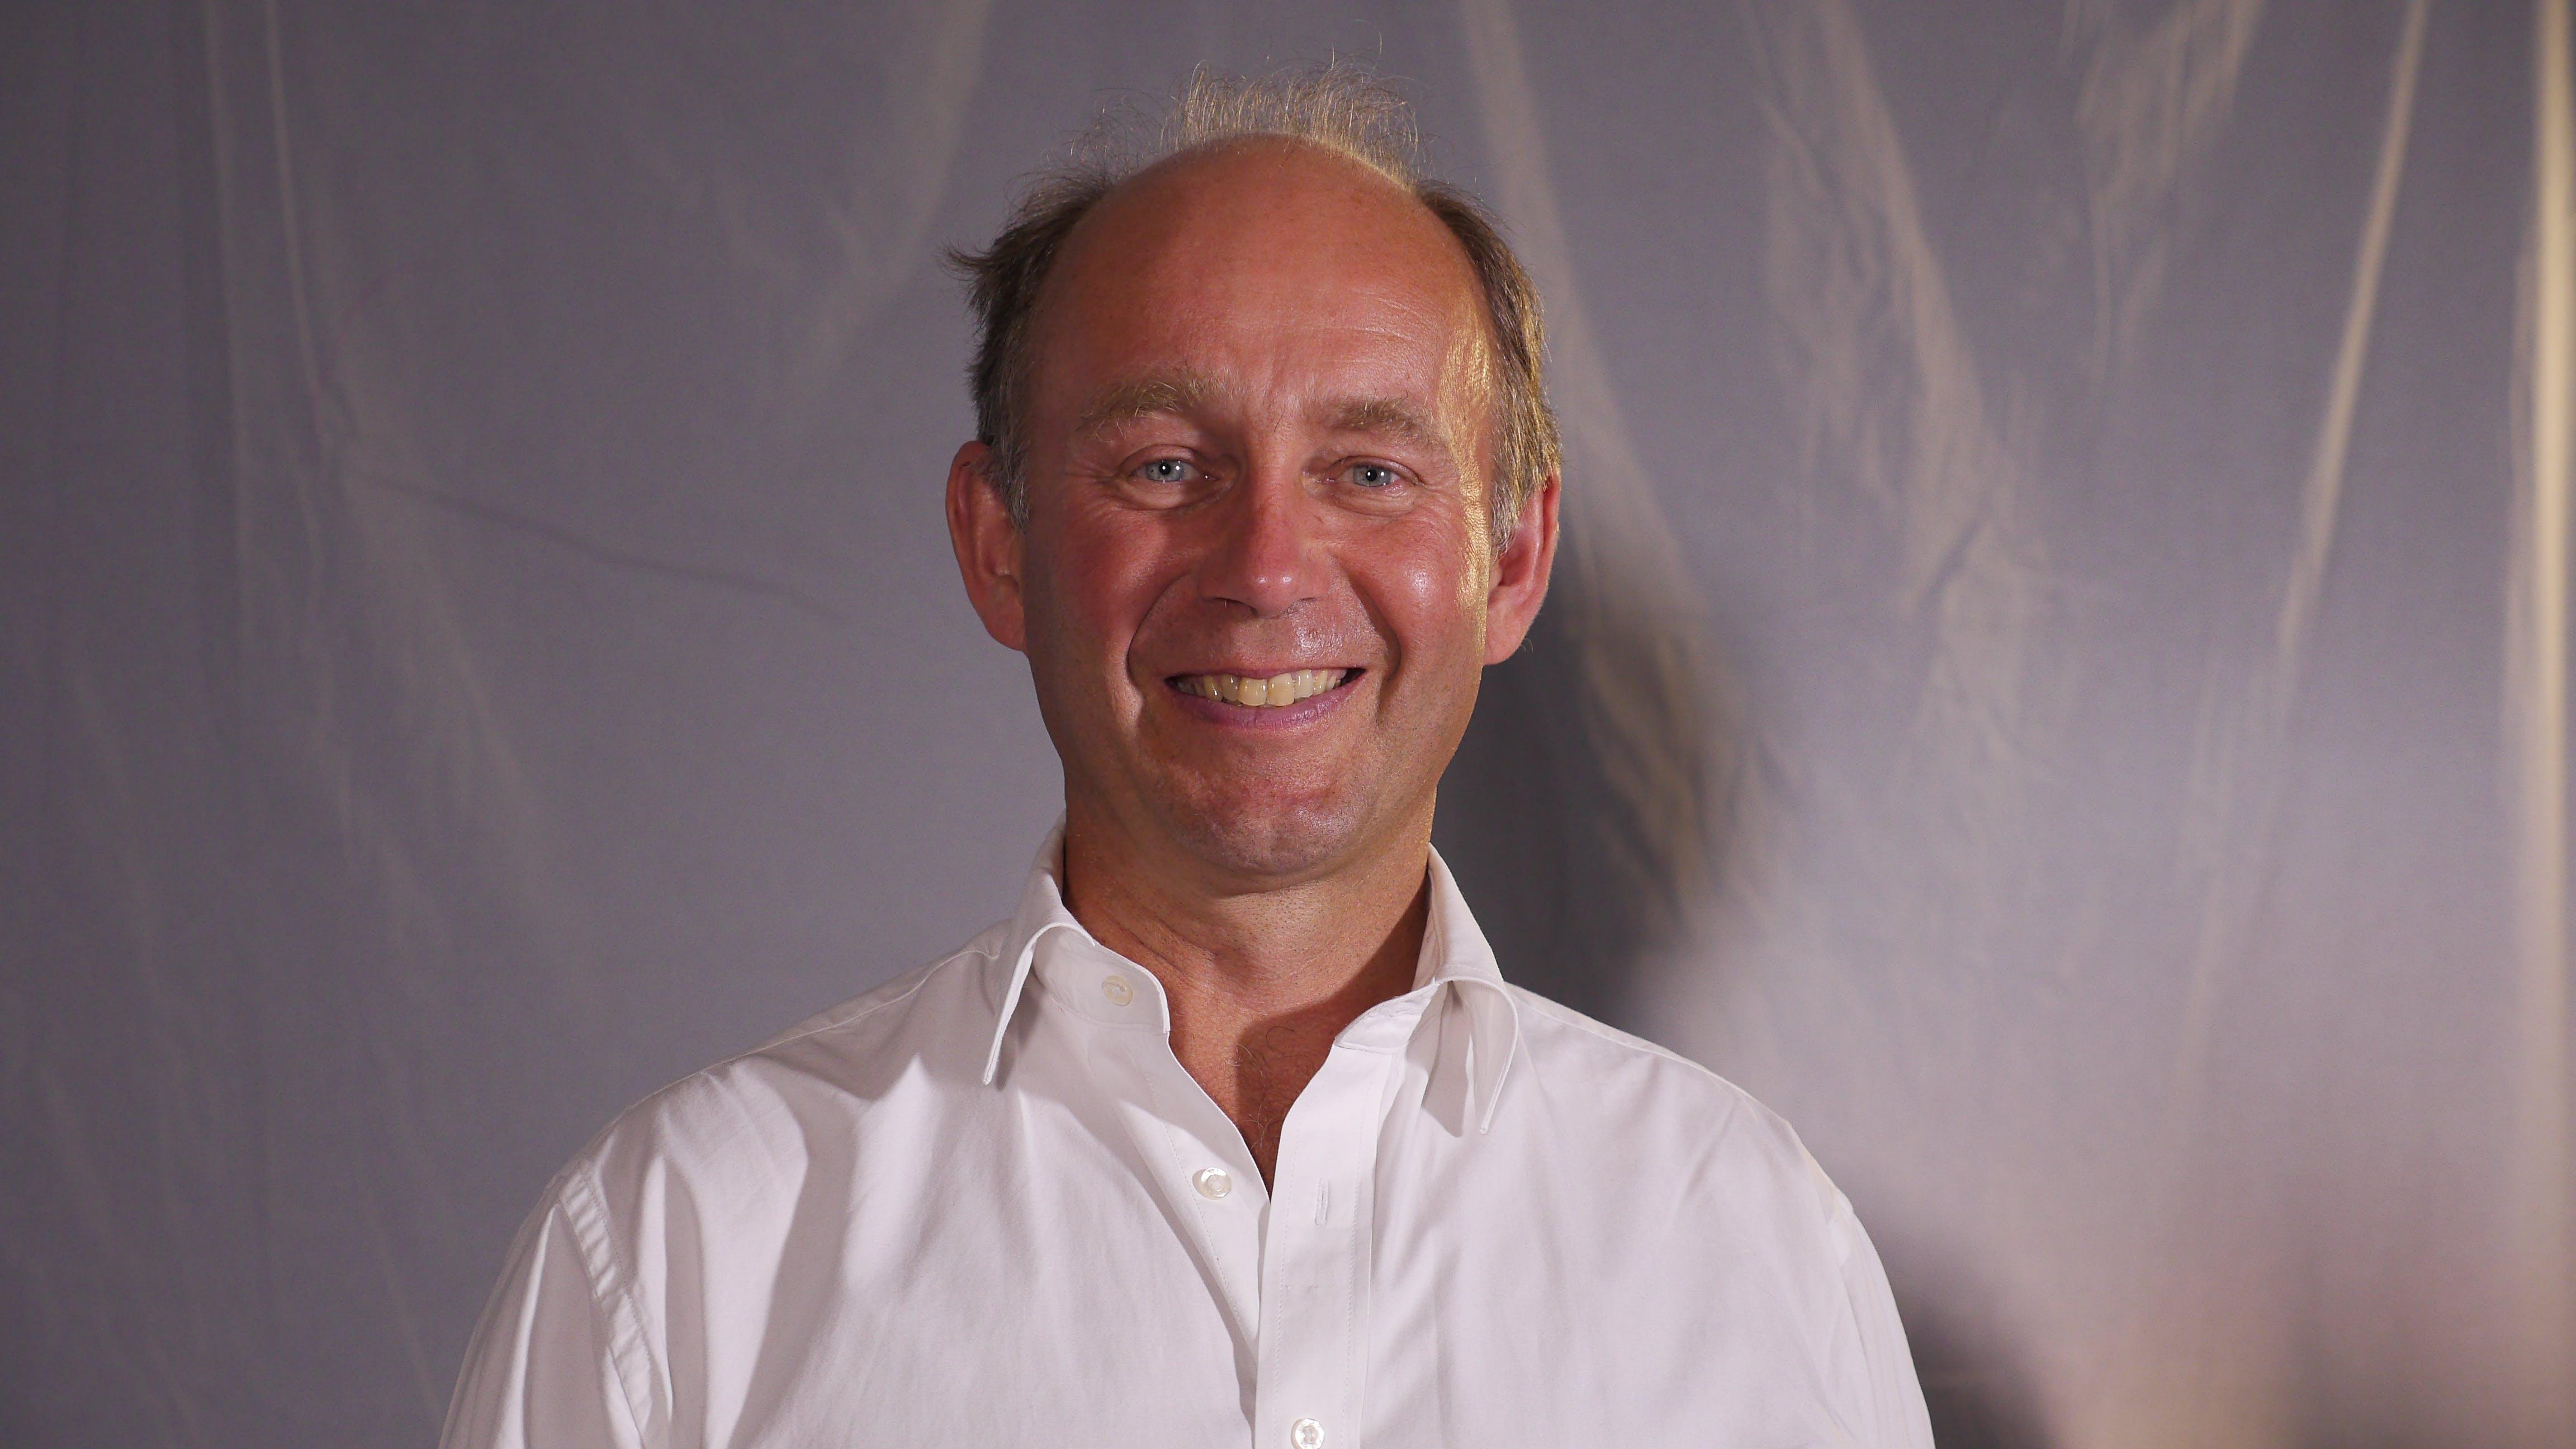 Olivier Debarre